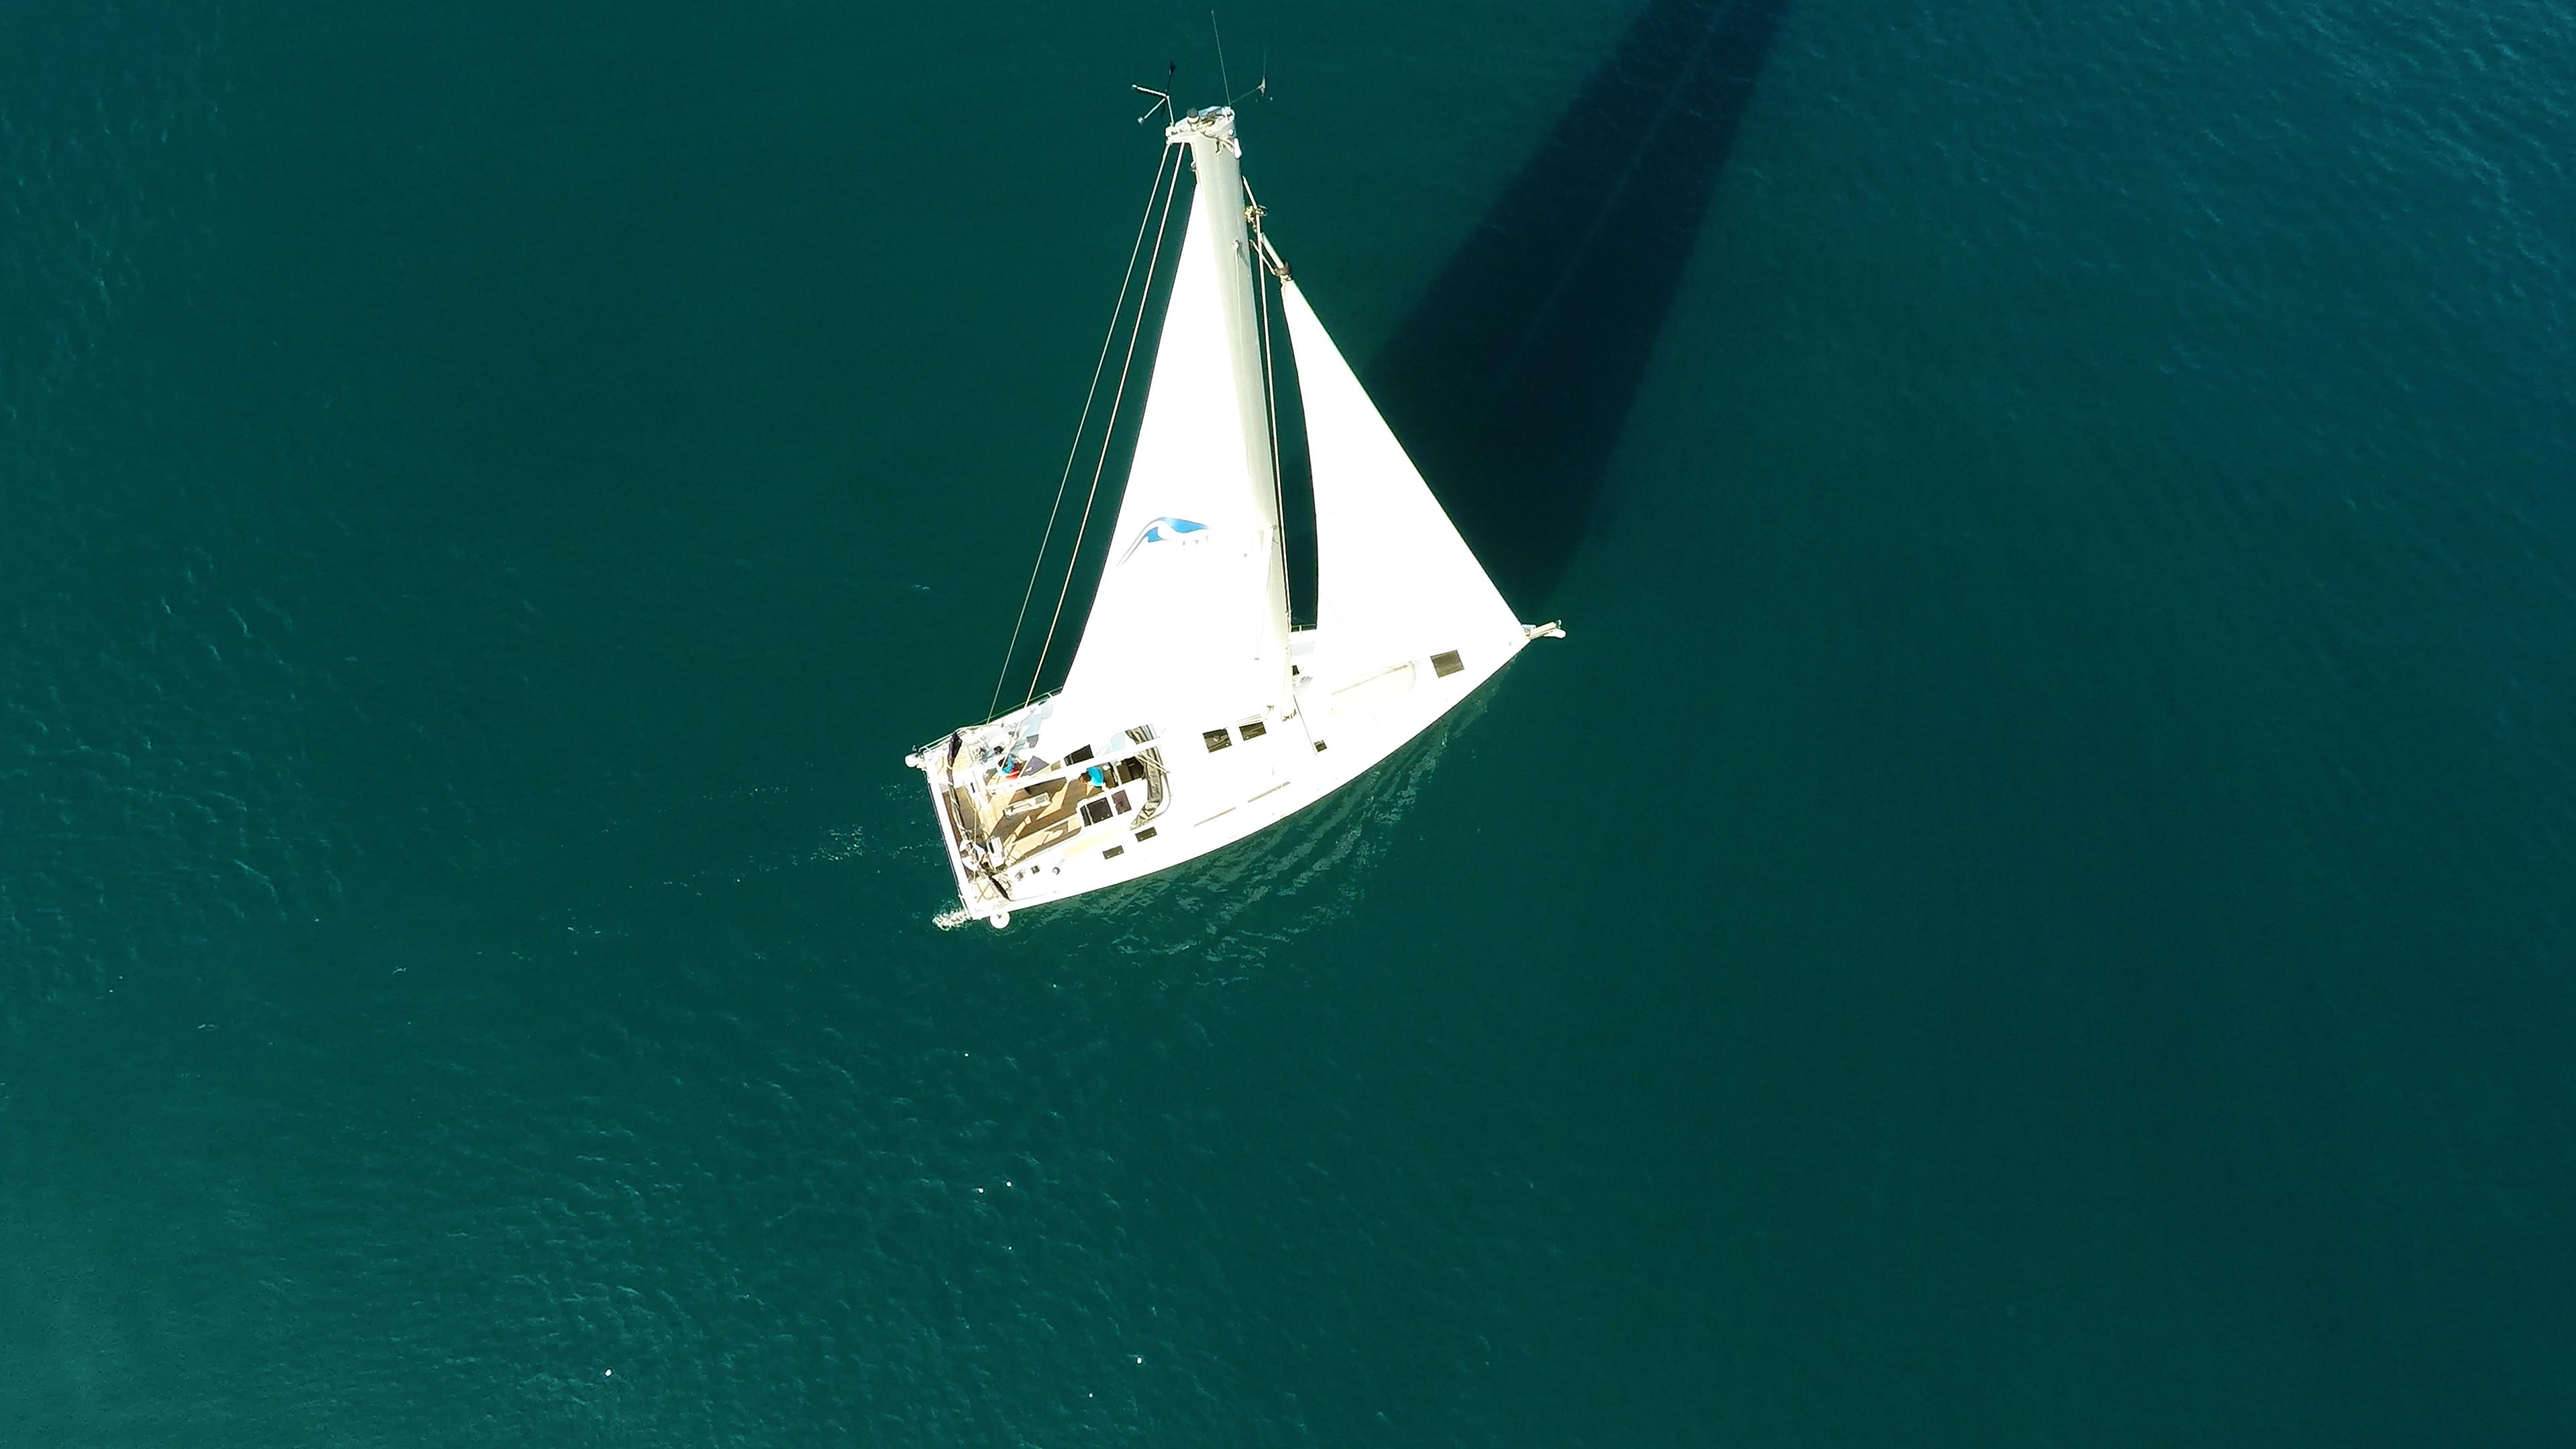 barcha a vela Hanse 505 yacht a vela barca veleggiare al mare ponte genova